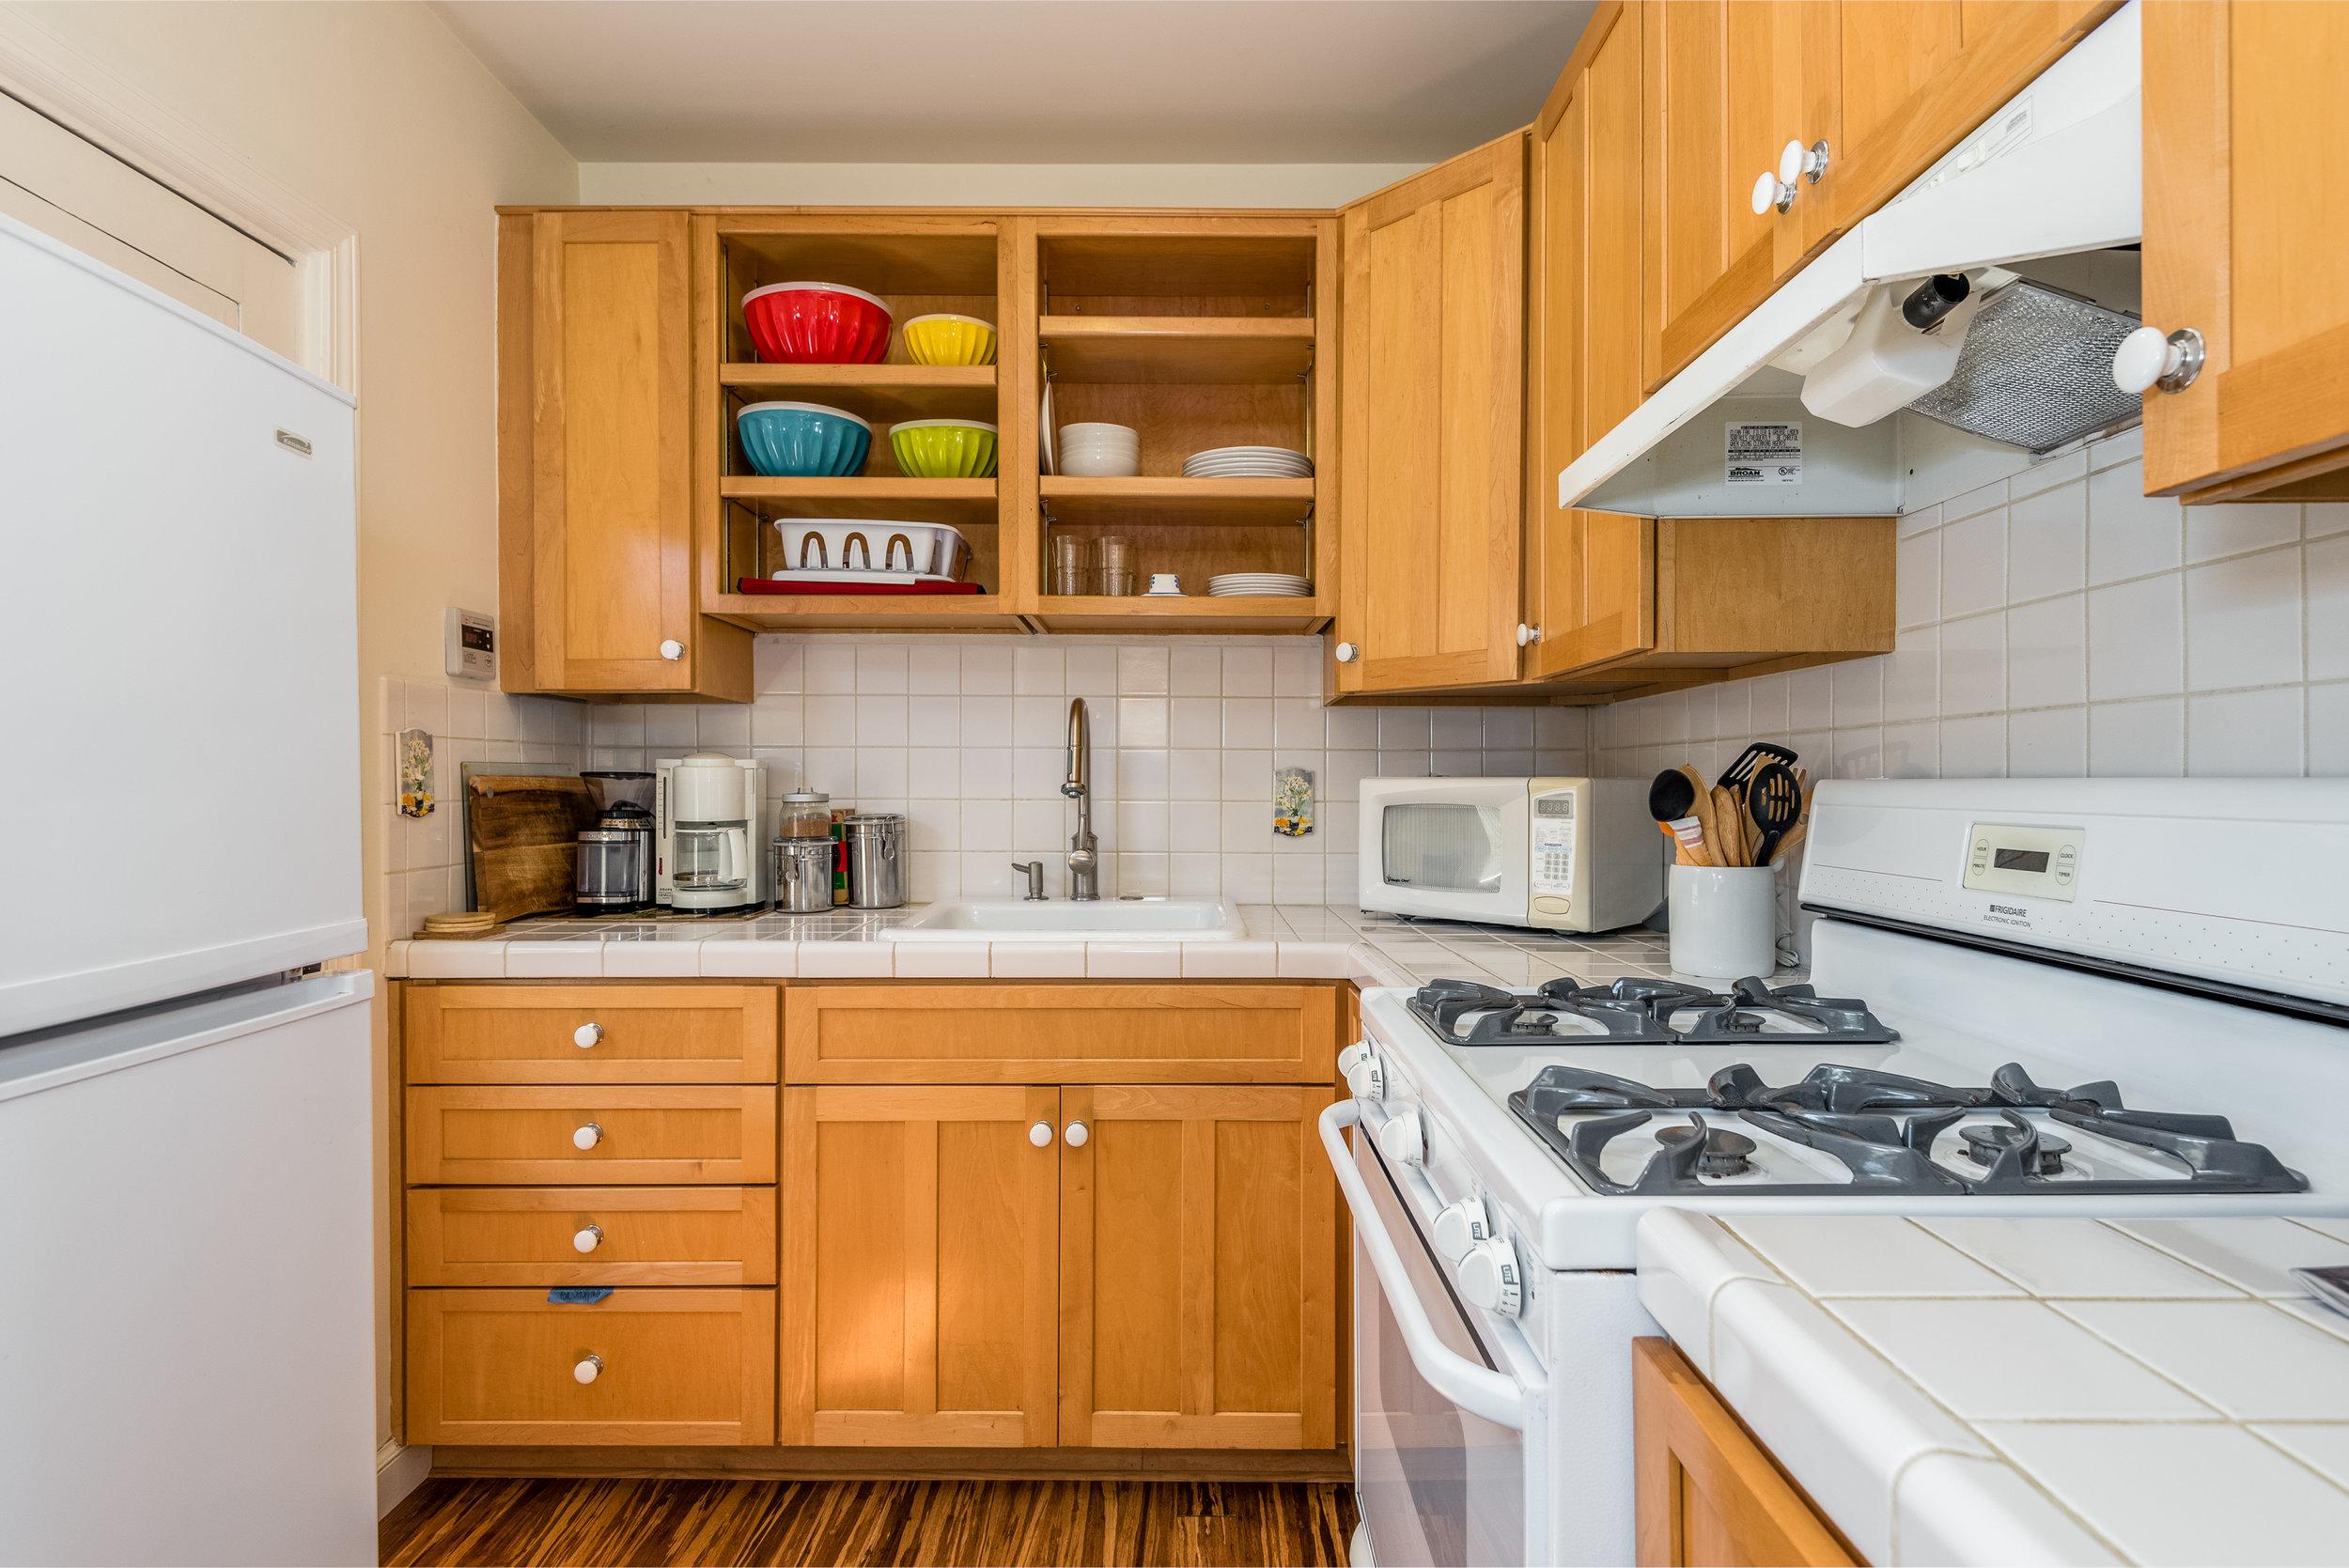 25-Guest Unit Kitchen.jpg